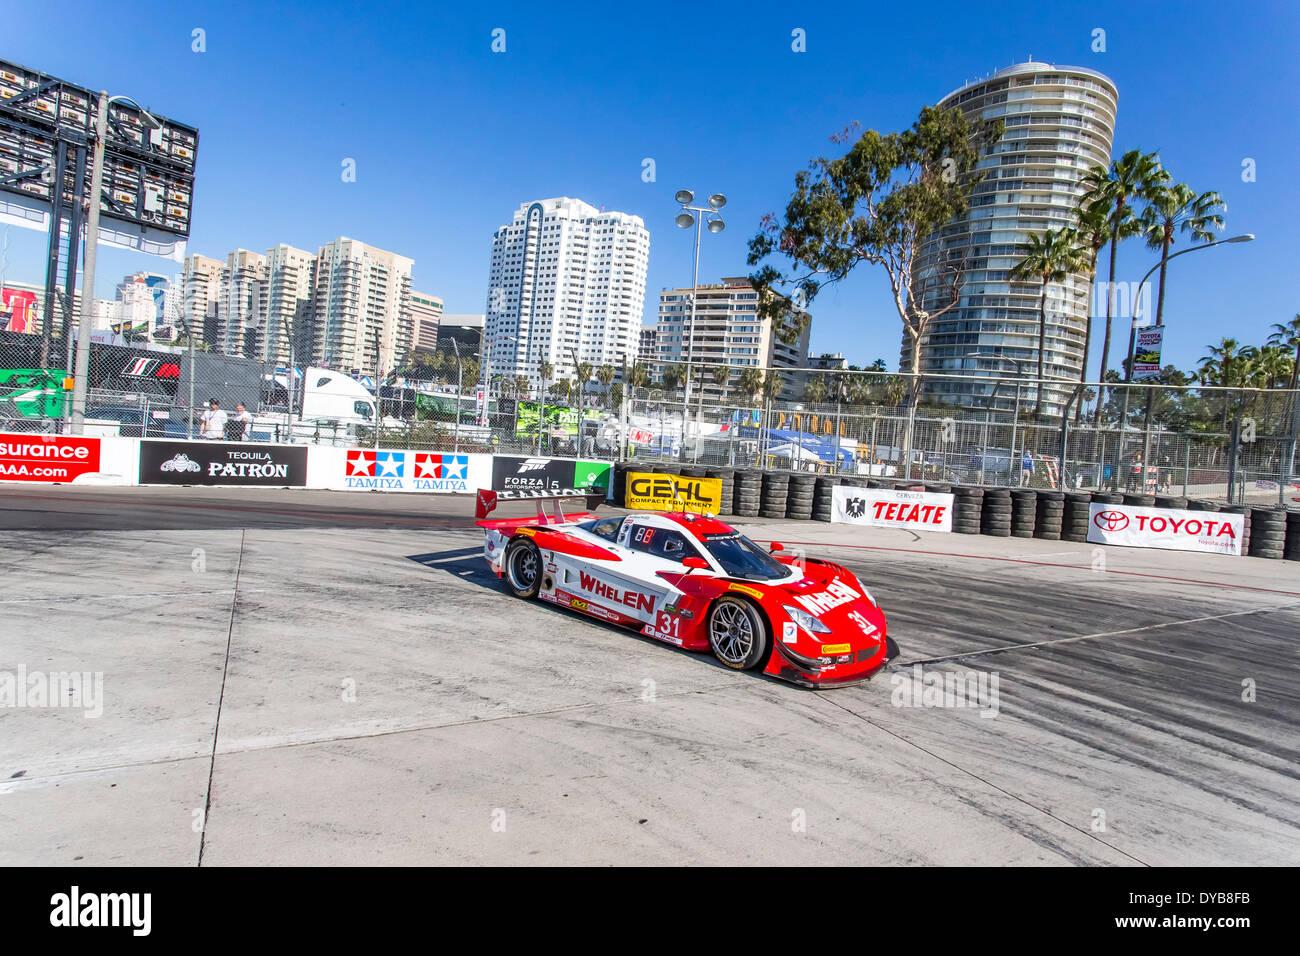 Long Beach, CA, USA. 11th Apr, 2014. Long Beach, CA - Apr 11, 2014: The Marsh Racing Corvette DP car goes on track Stock Photo